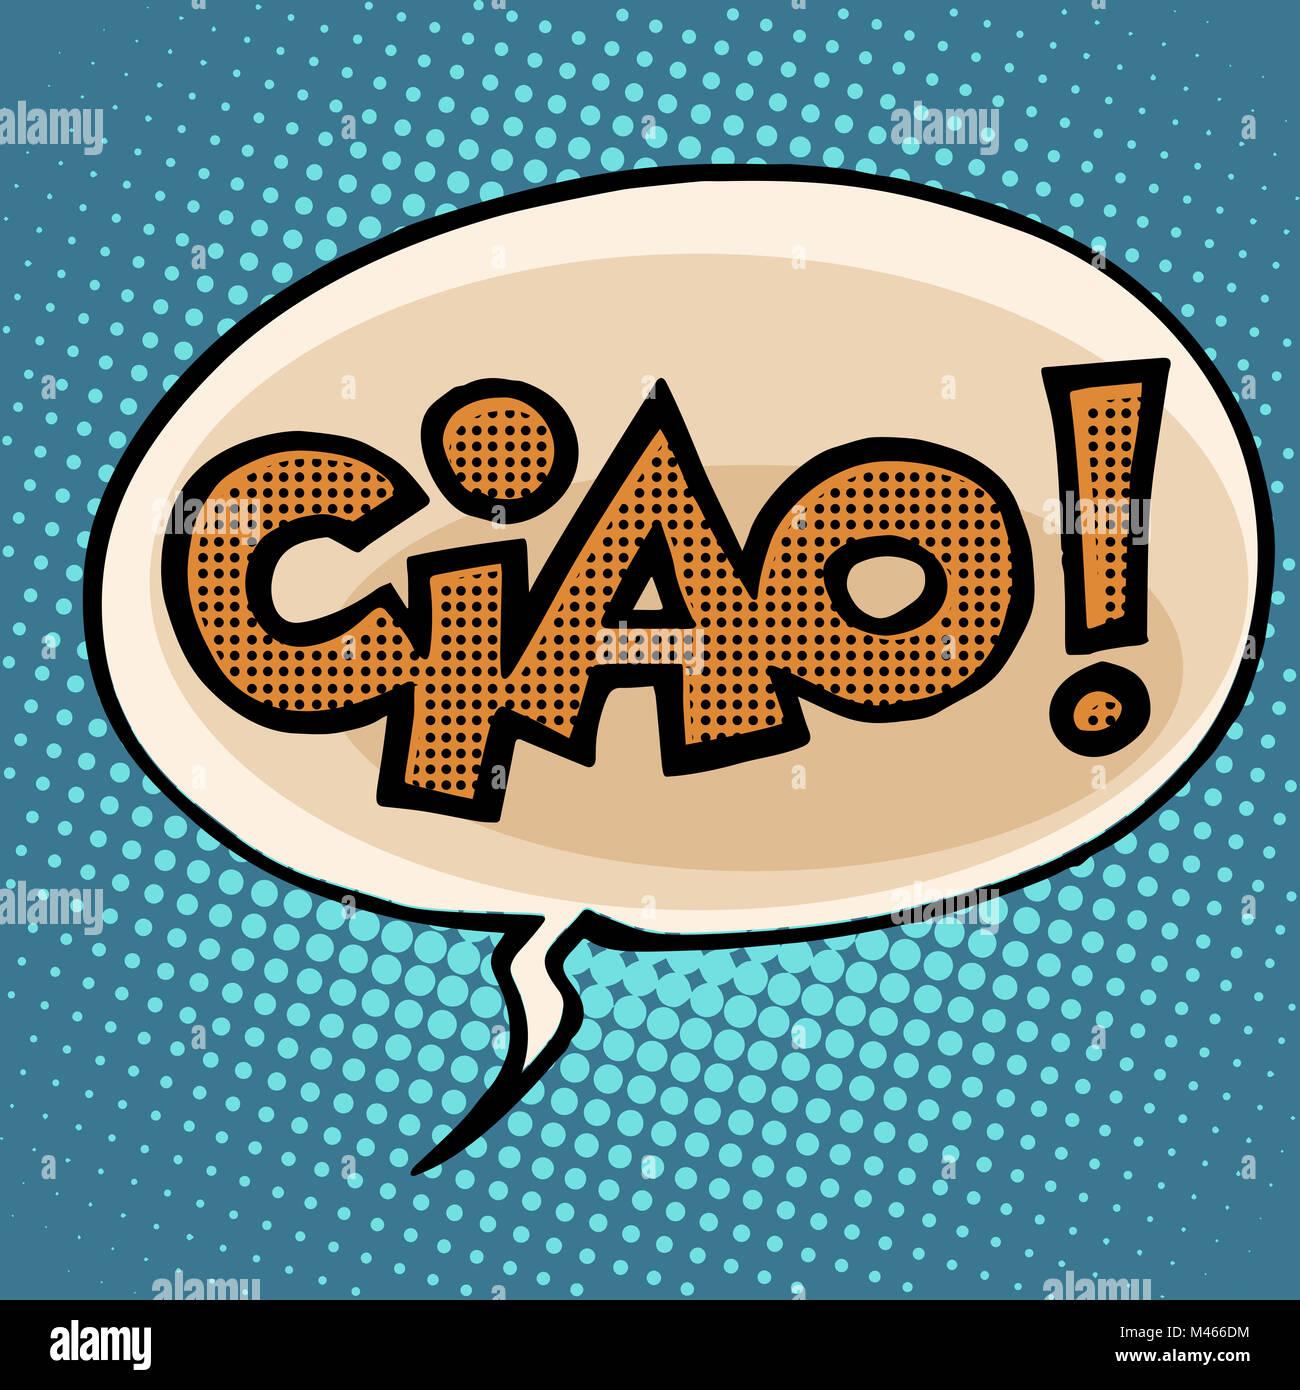 ciao goodbye bubble comic text - Stock Image